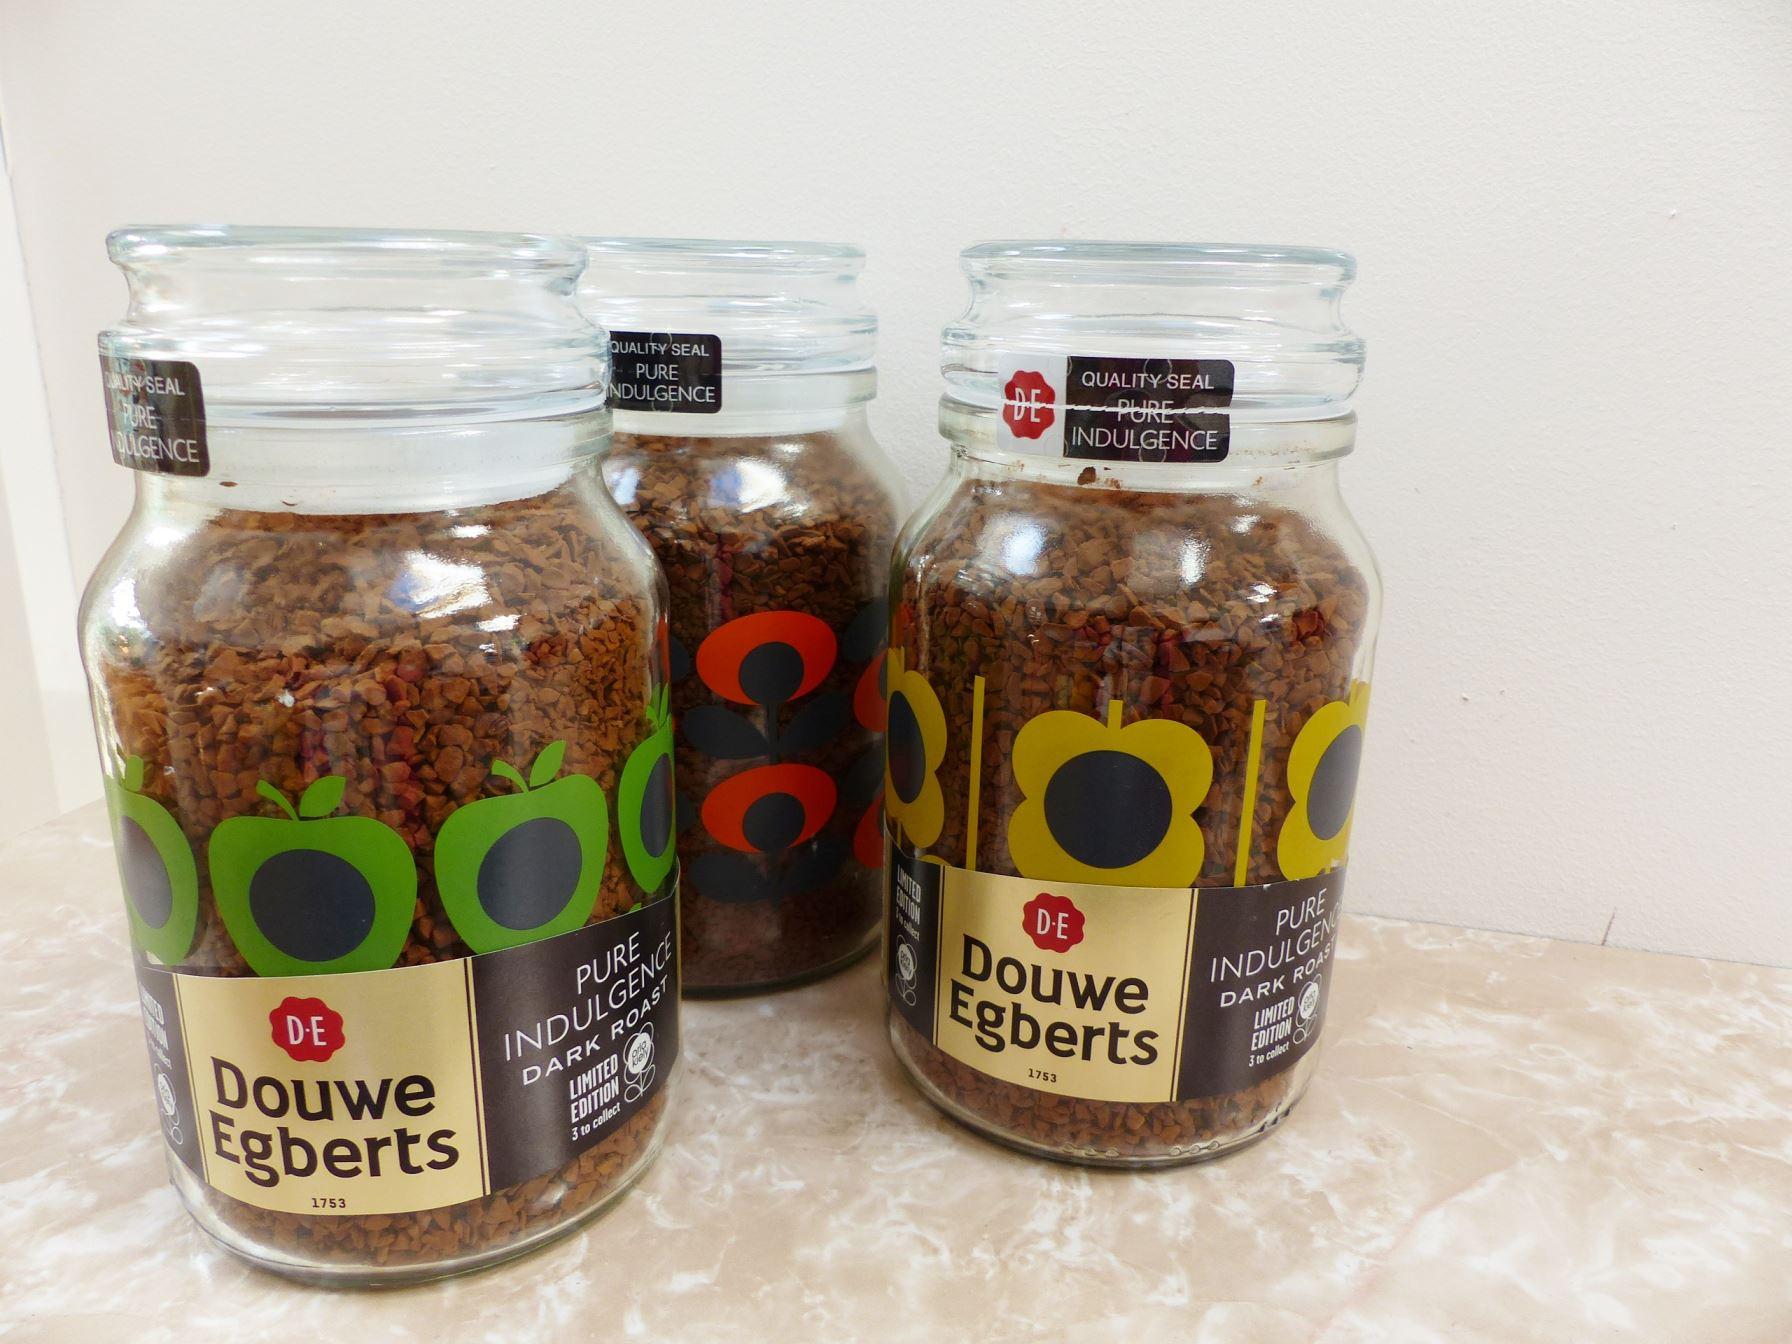 Orla Kiely S Coffee Jars For Douwe Egberts Kate Beavis Vintage Expert Test